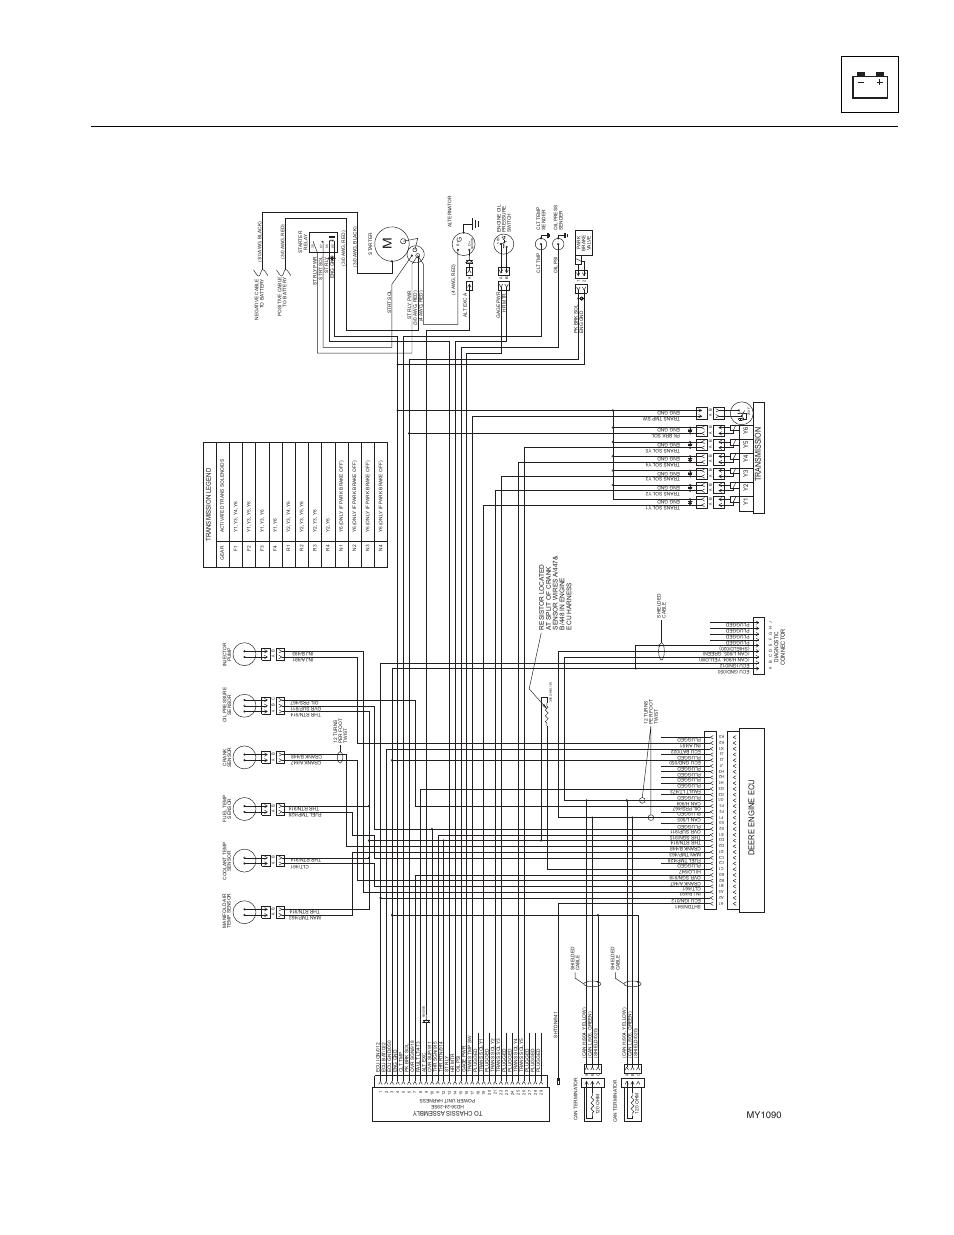 medium resolution of 10 power unit schematic john deere power unit schematic john deere my1090